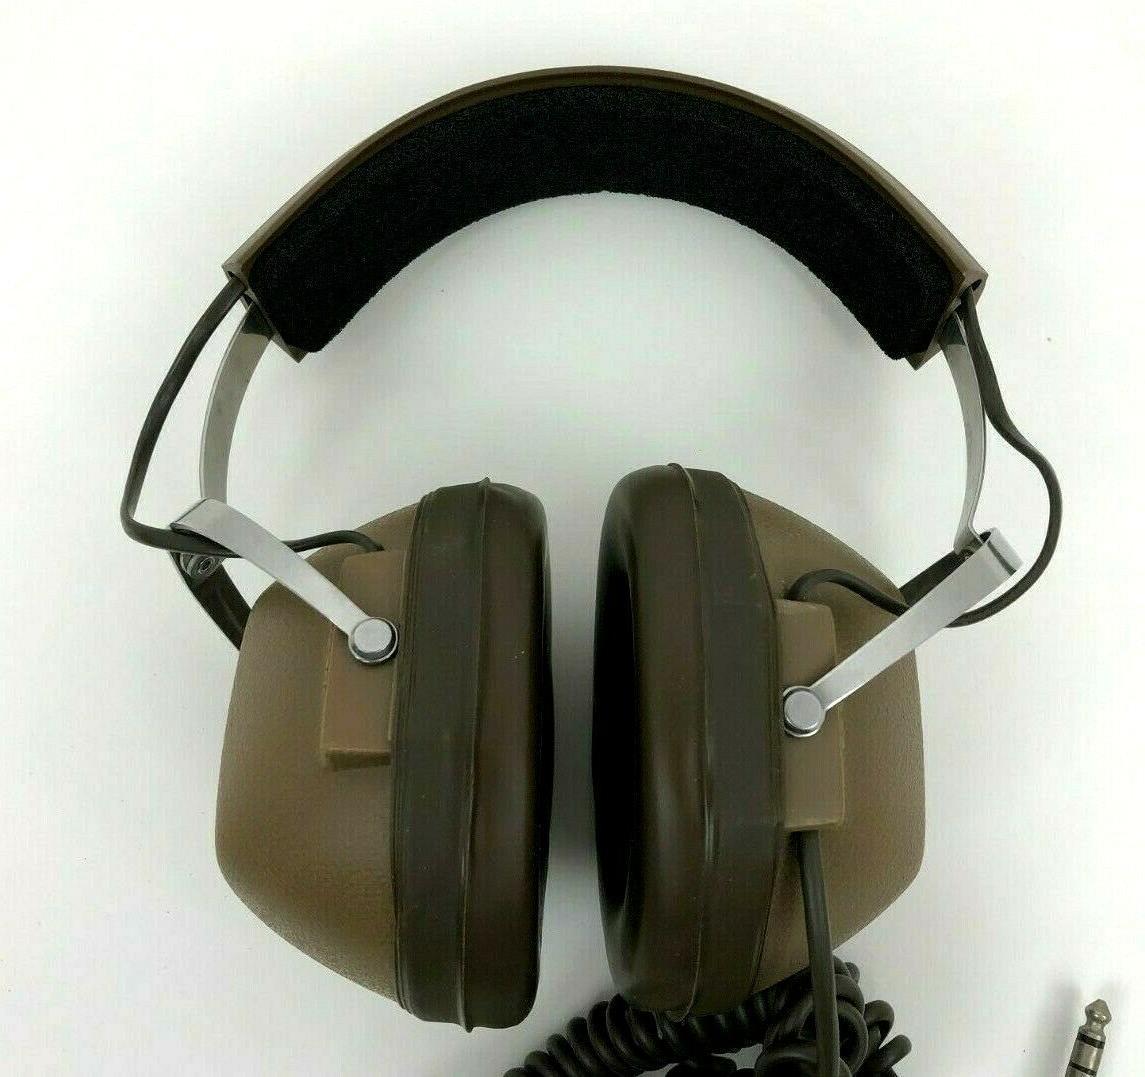 VINTAGE HEADPHONES Earphones